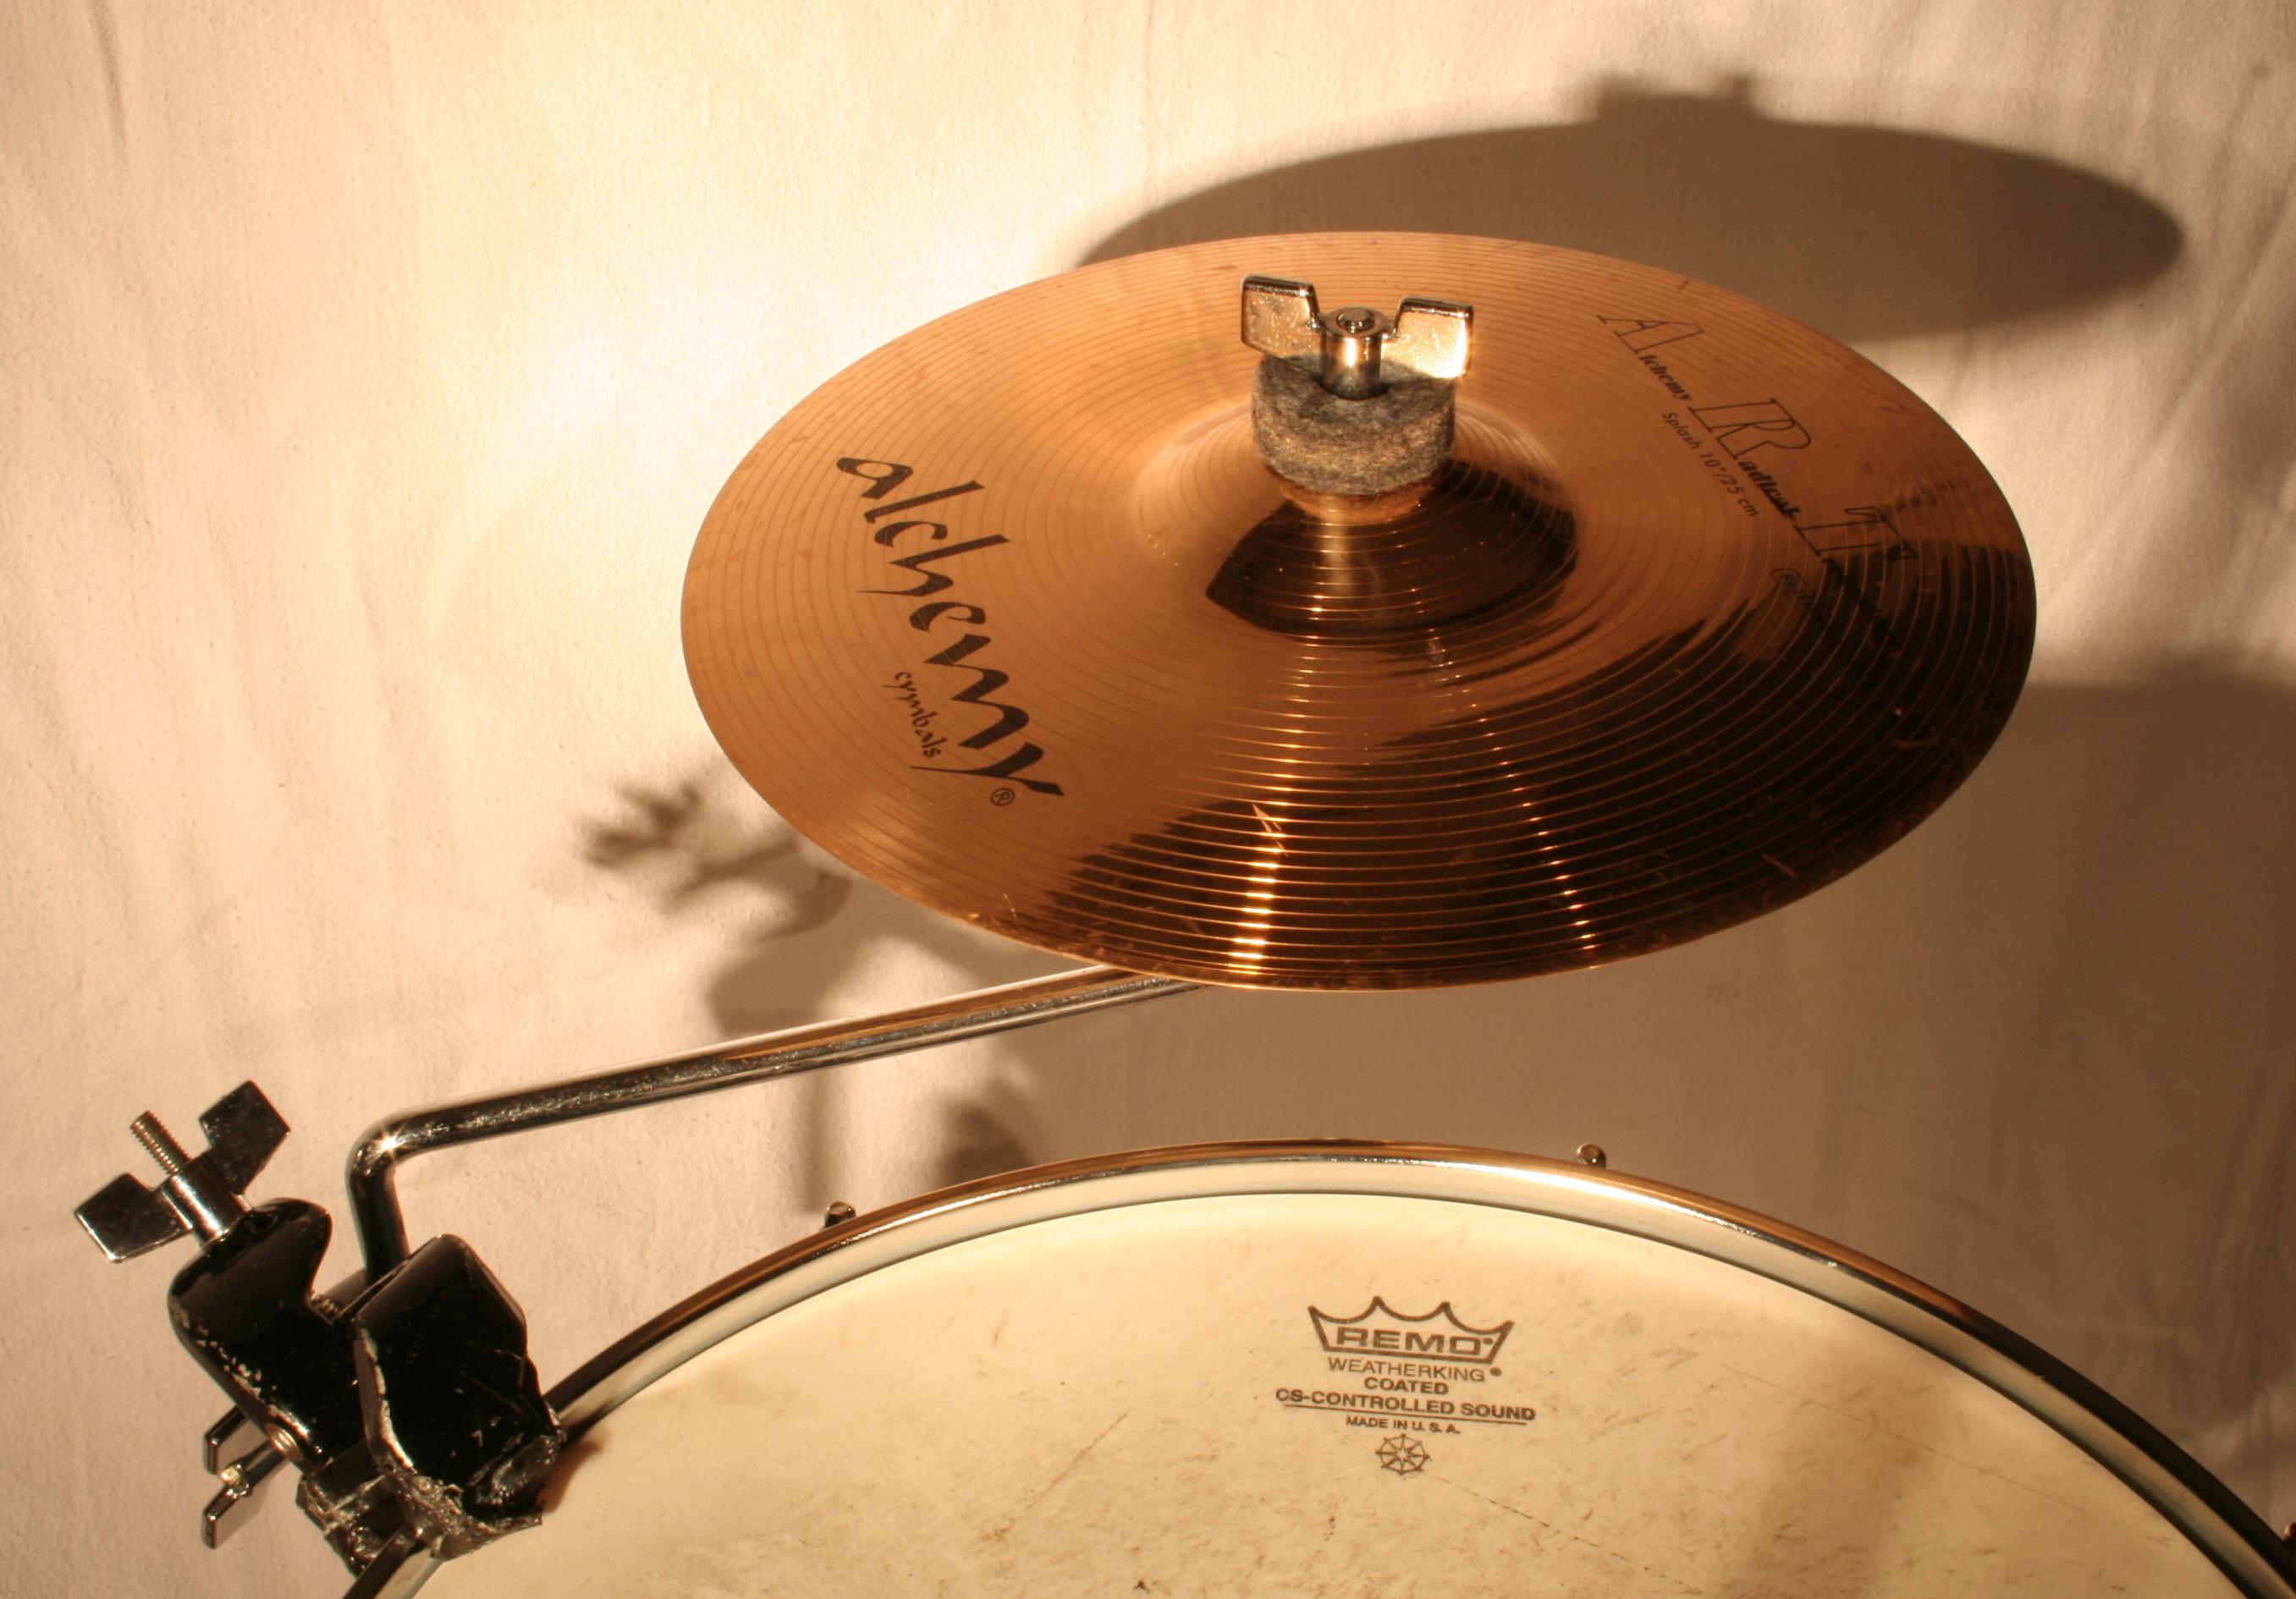 Cymbal stand - Wikipedia, the free encyclopedia